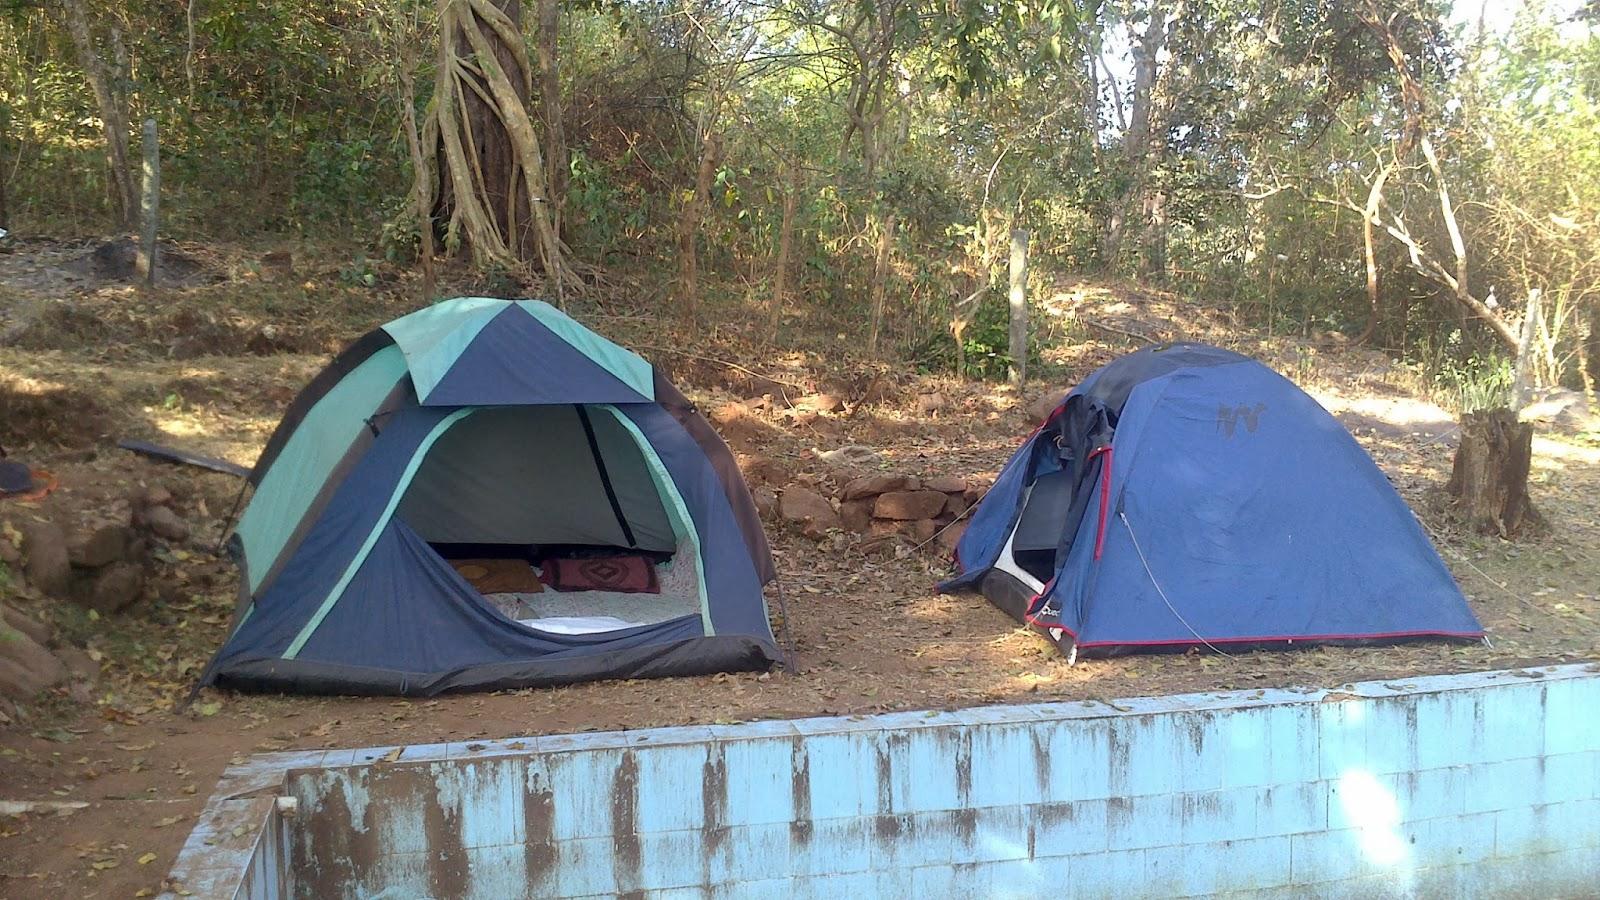 Dandeli India  city pictures gallery : Dandeli Jungle Camp stay in the wild ~ eNidhi India